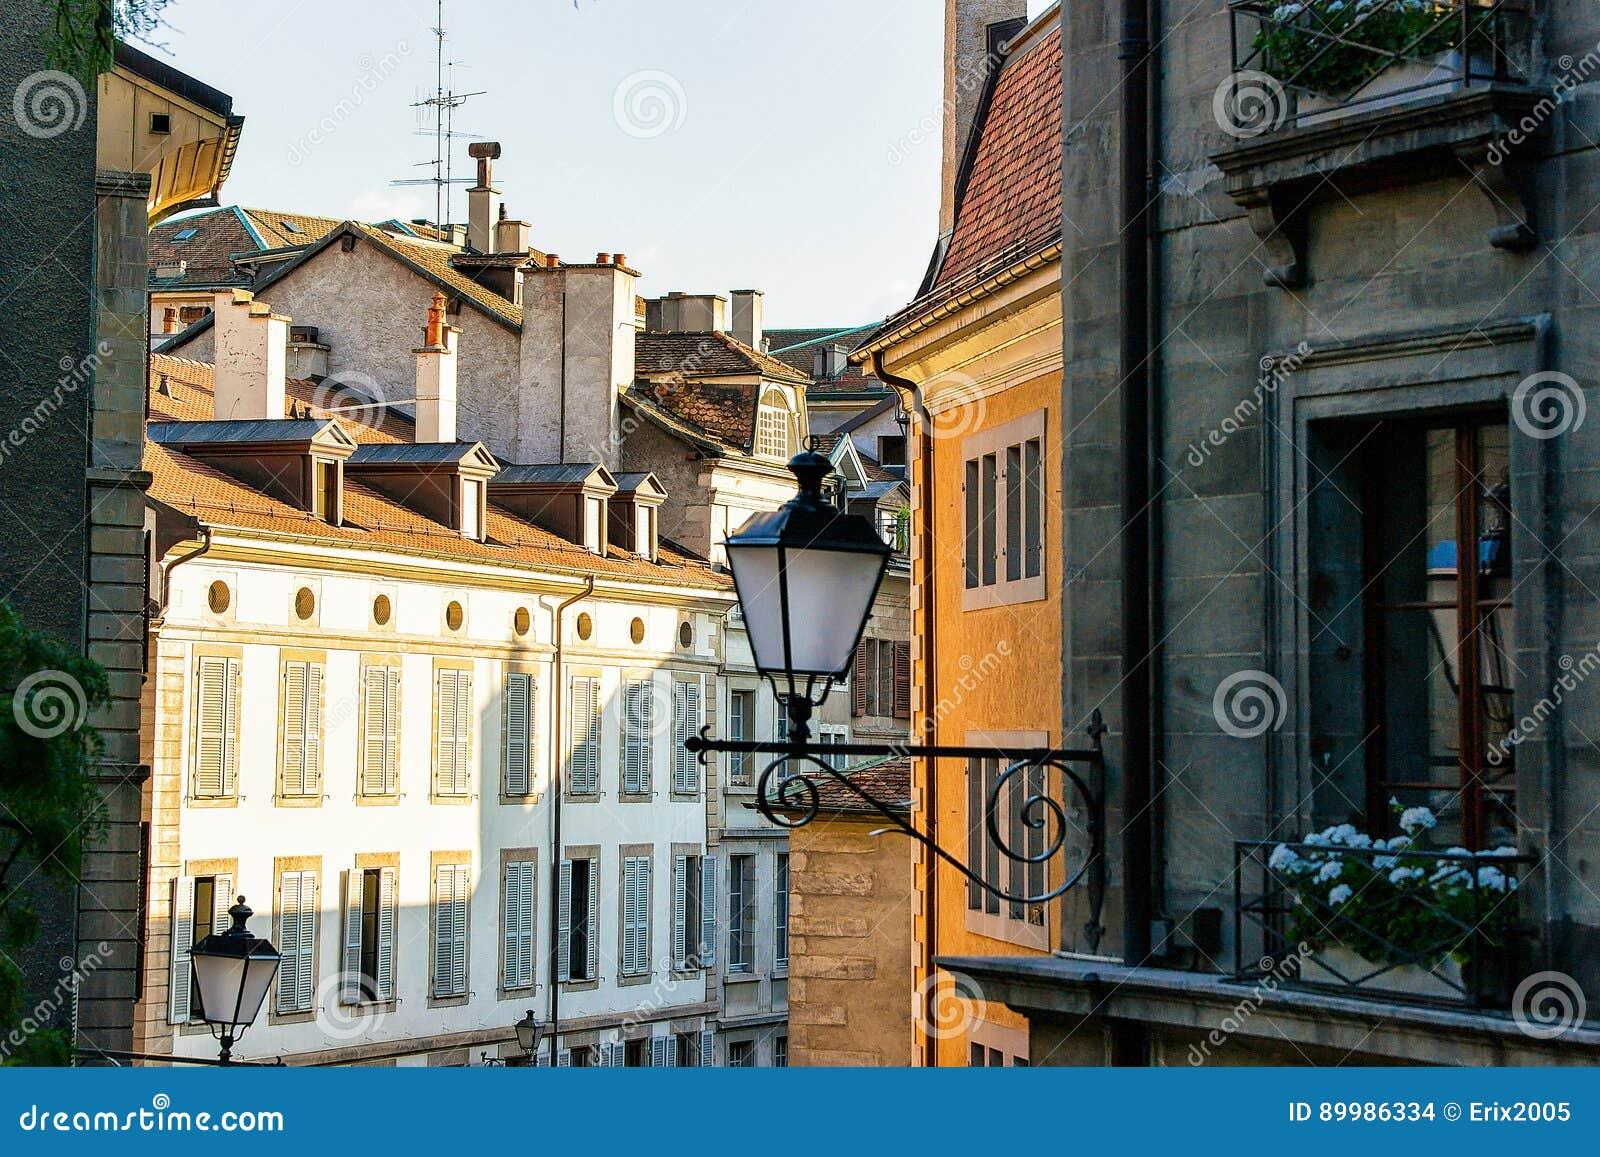 Lantern in street at Geneva old city center